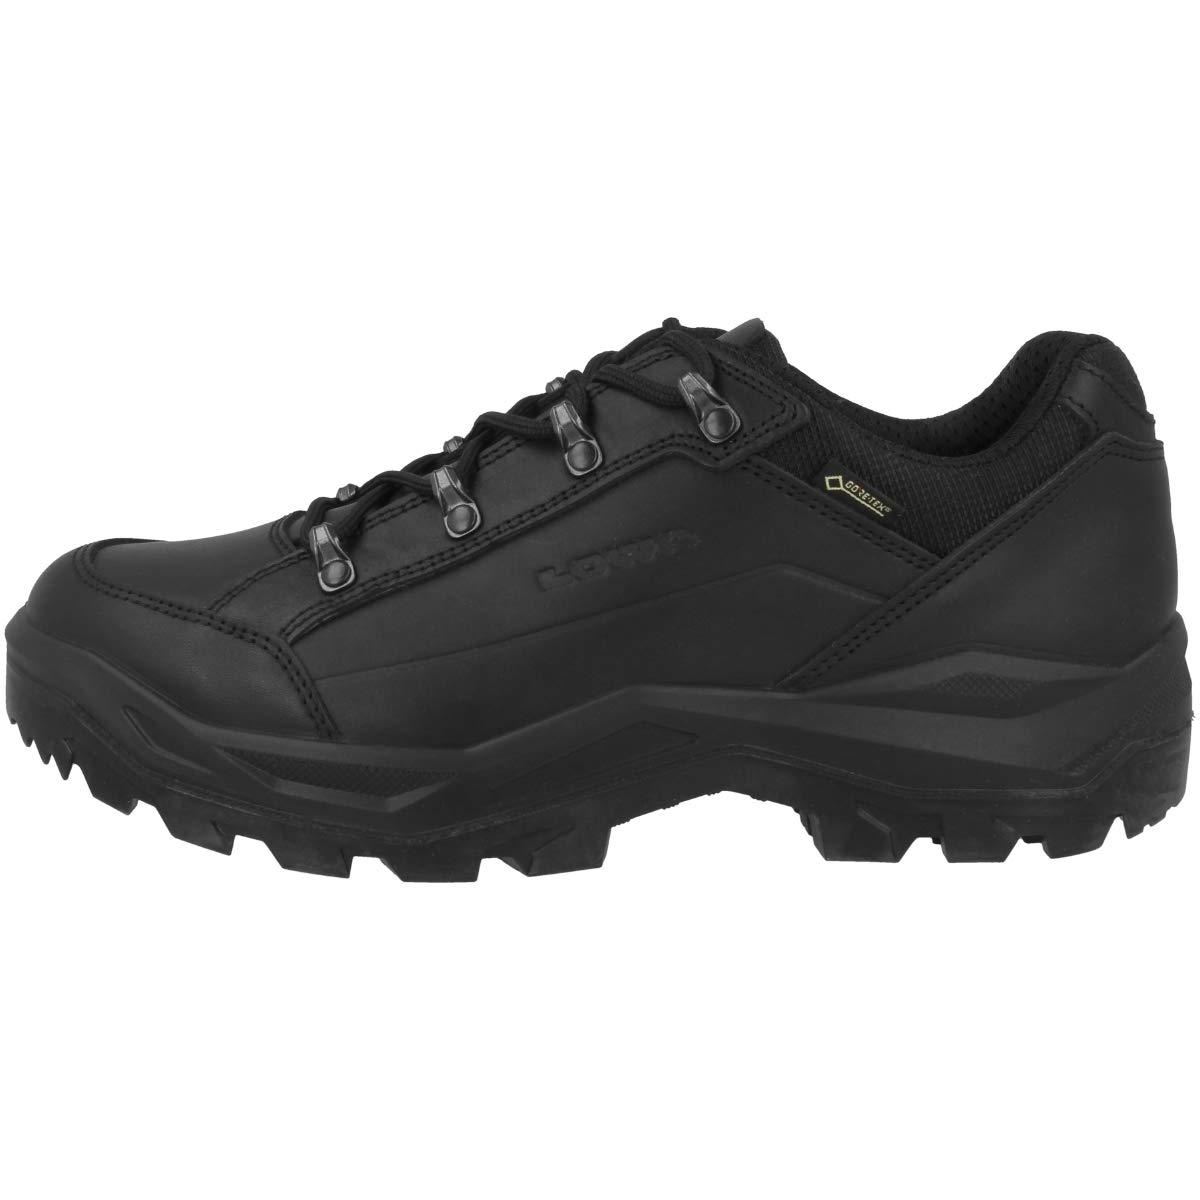 bbae9761e1c Lowa Renegade II GTX LO TF Black (46): Amazon.ca: Shoes & Handbags